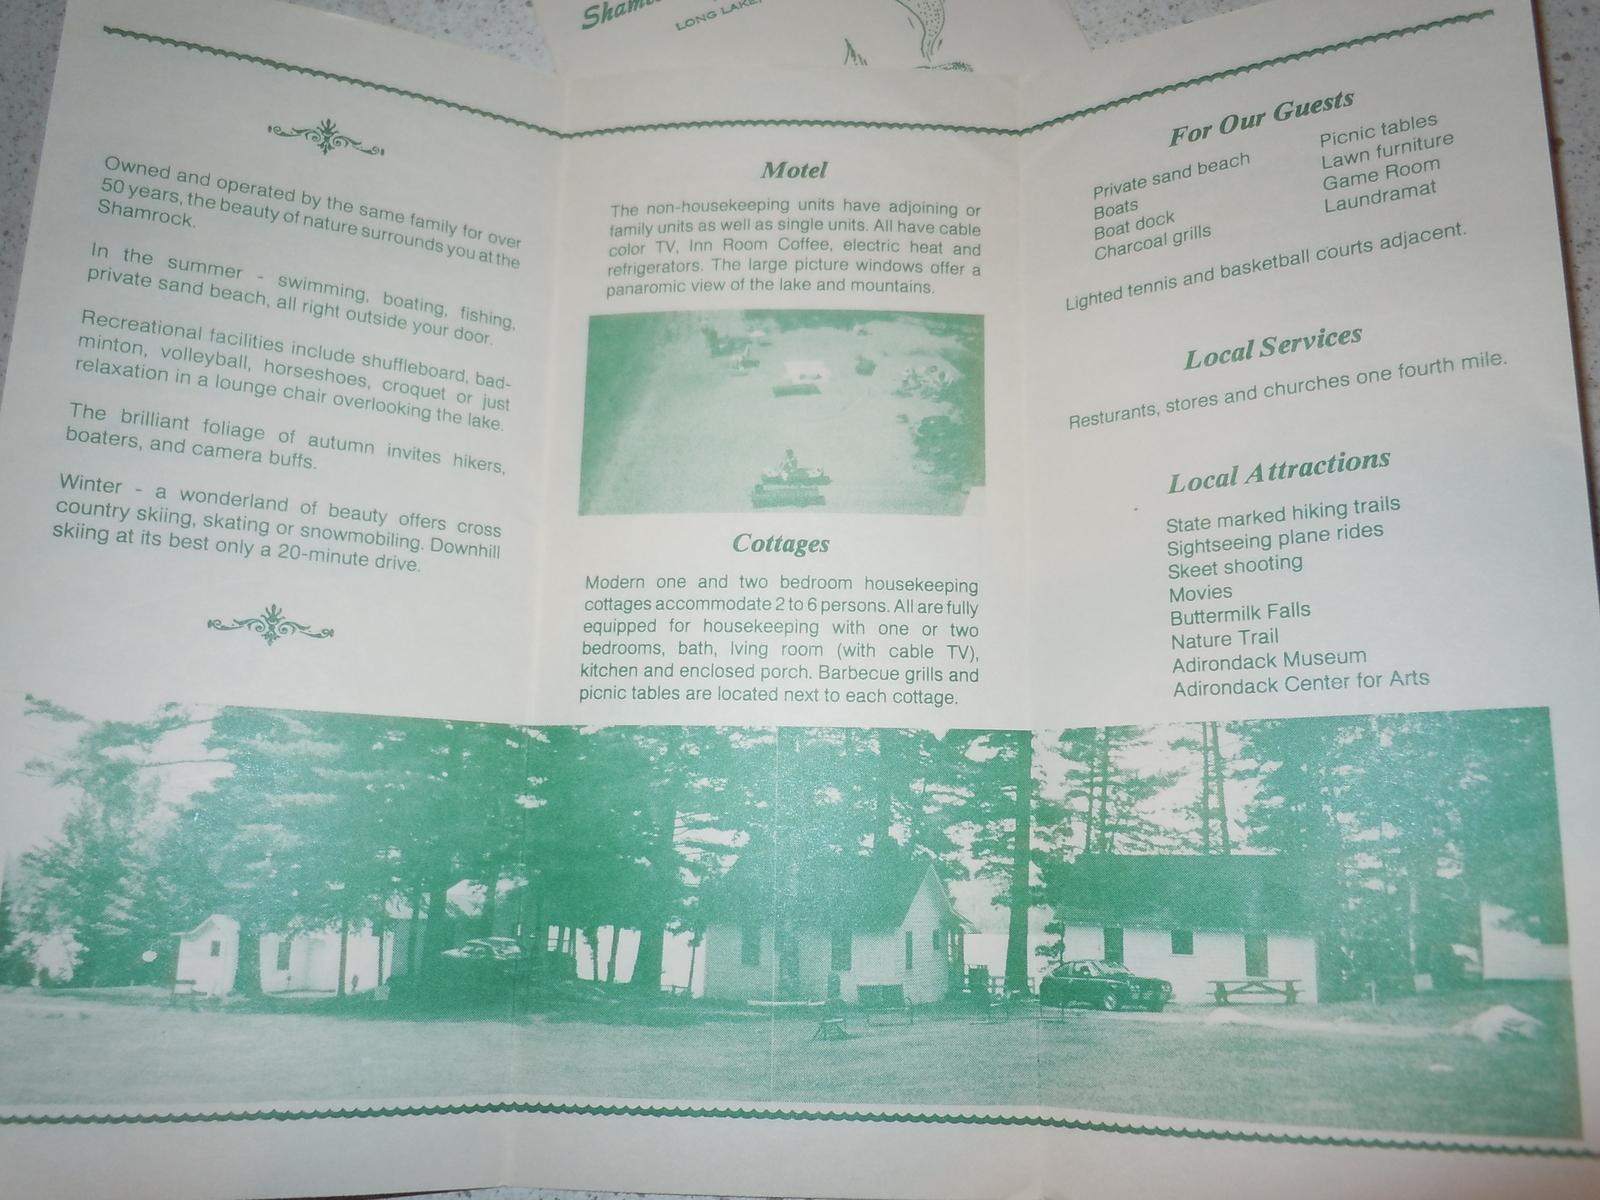 Shamrock Motel and Cottages Long Lake New York 1950's Brochure